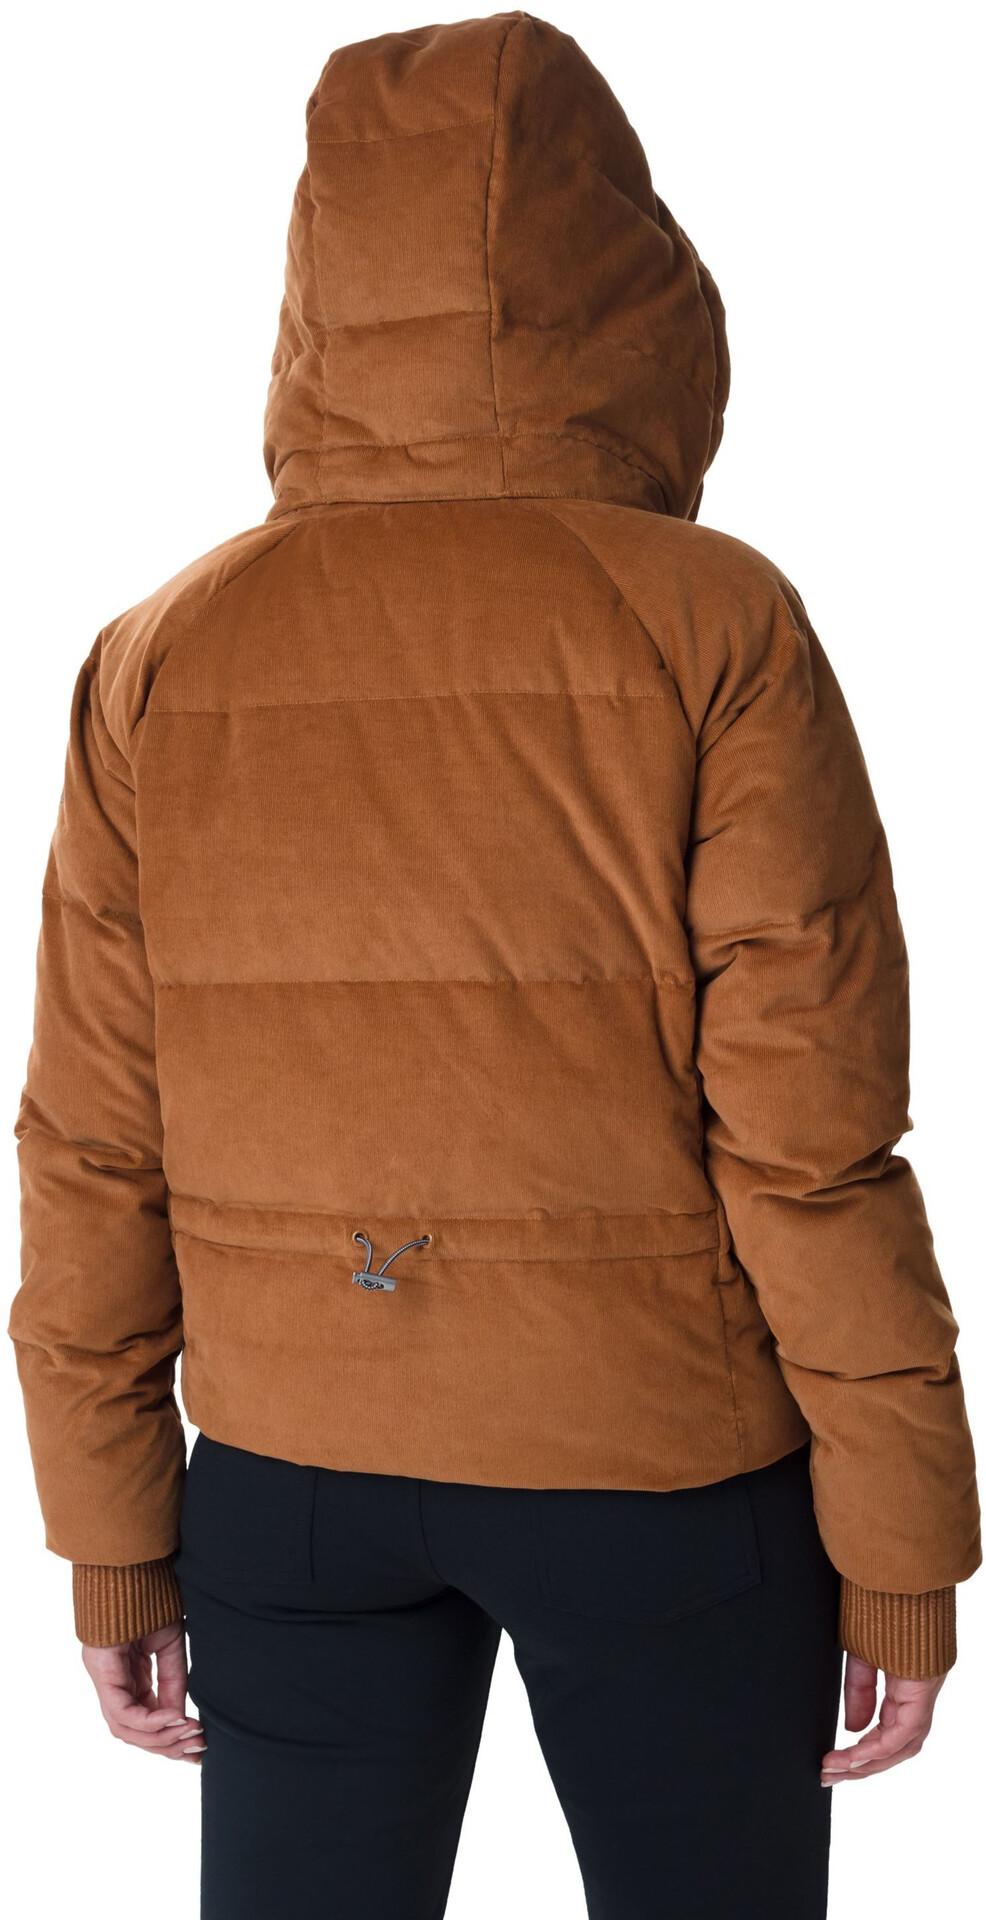 Columbia Ruby Falls Manteau en duvet Femme, camel brown corduroy